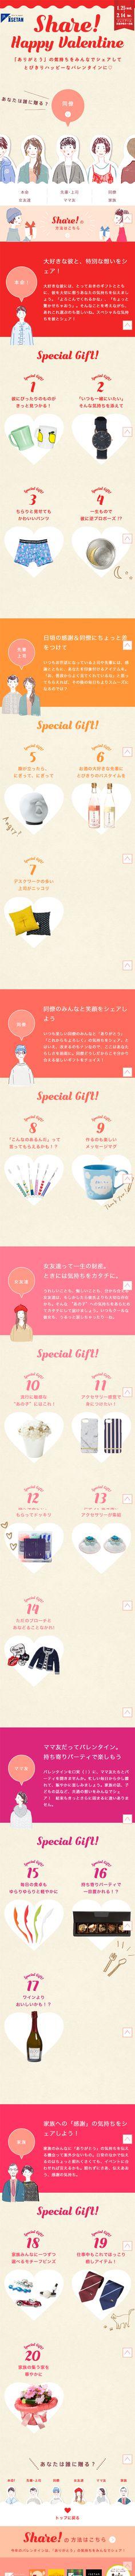 Share! Happy Valentine【和菓子・洋菓子・スイーツ関連】のLPデザイン。WEBデザイナーさん必見!スマホランディングページのデザイン参考に(かわいい系) Site Design, Layout Design, Mobile Web Design, Valentines Design, Japan Design, Web Inspiration, Email Design, Web Banner, Banner Design